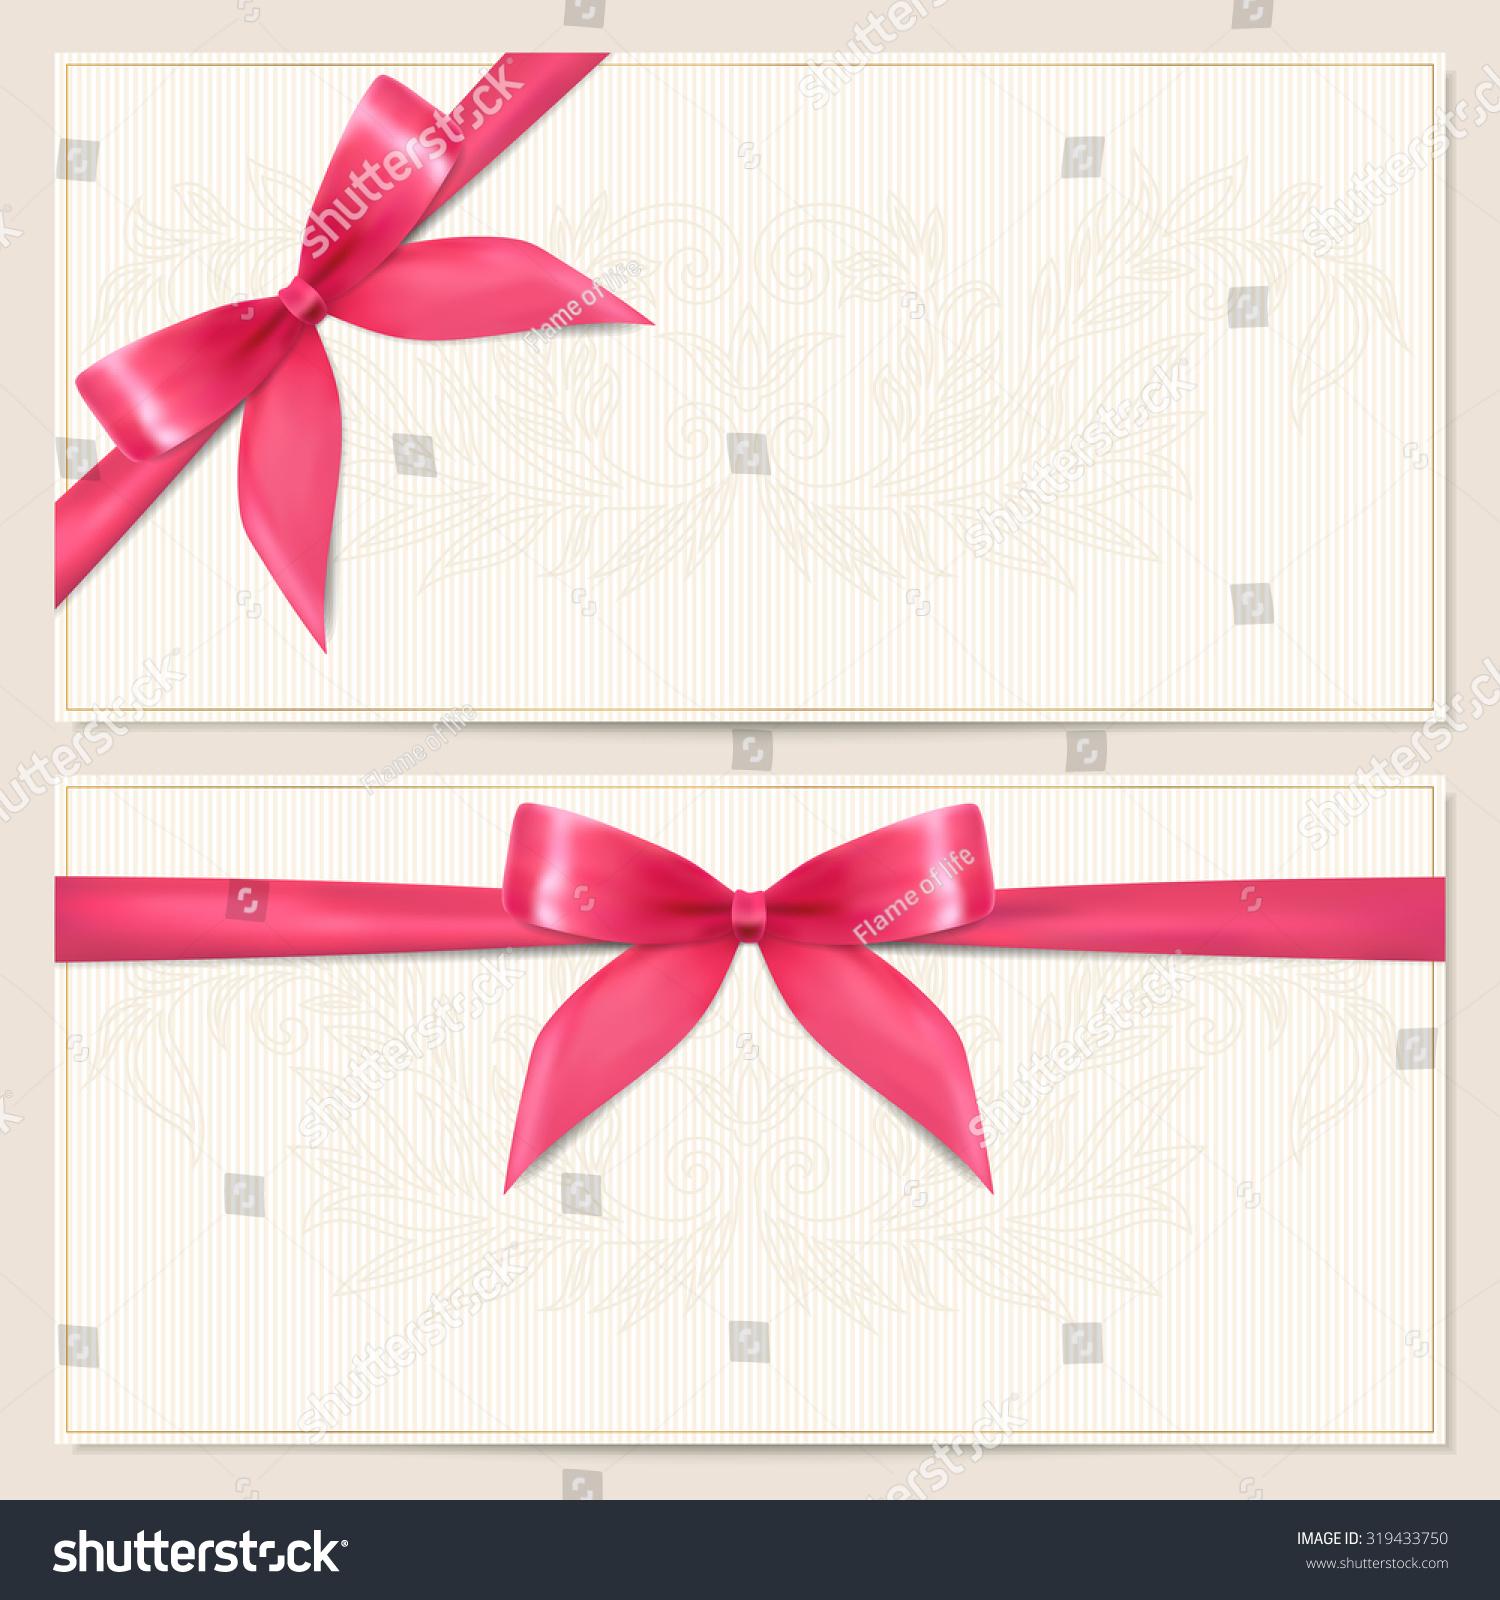 Gift Certificate Voucher Coupon Invitation Gift Stock Illustration